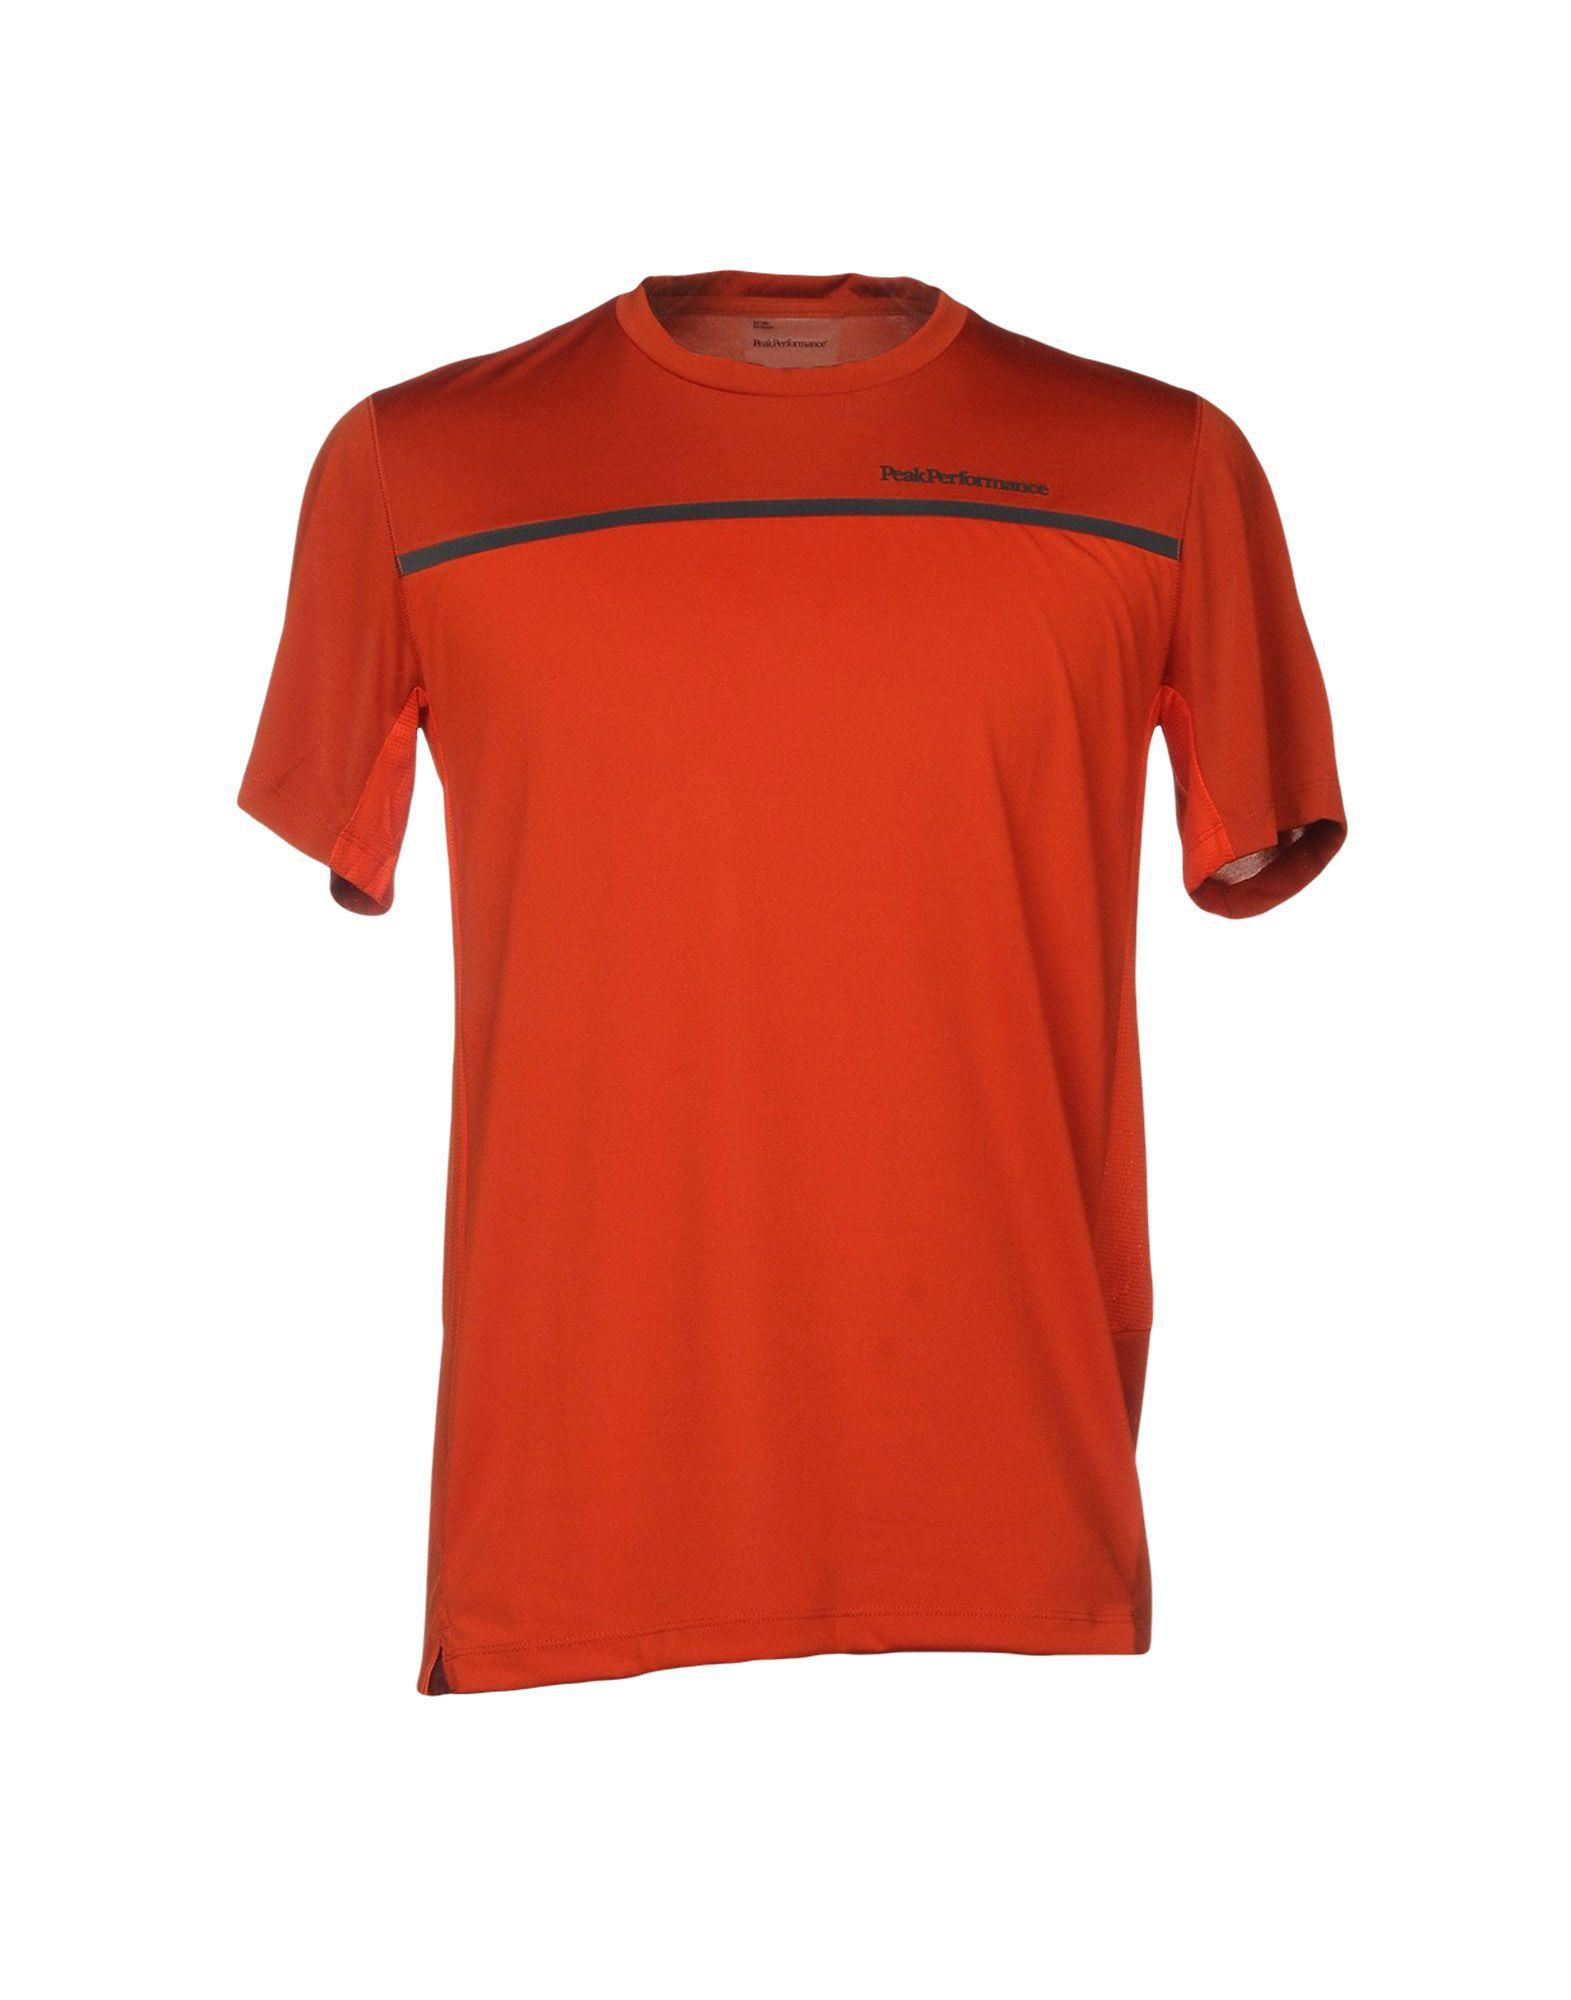 PEAK PERFORMANCE Футболка peak performance футболка поло peak performance gpan модель 2710424